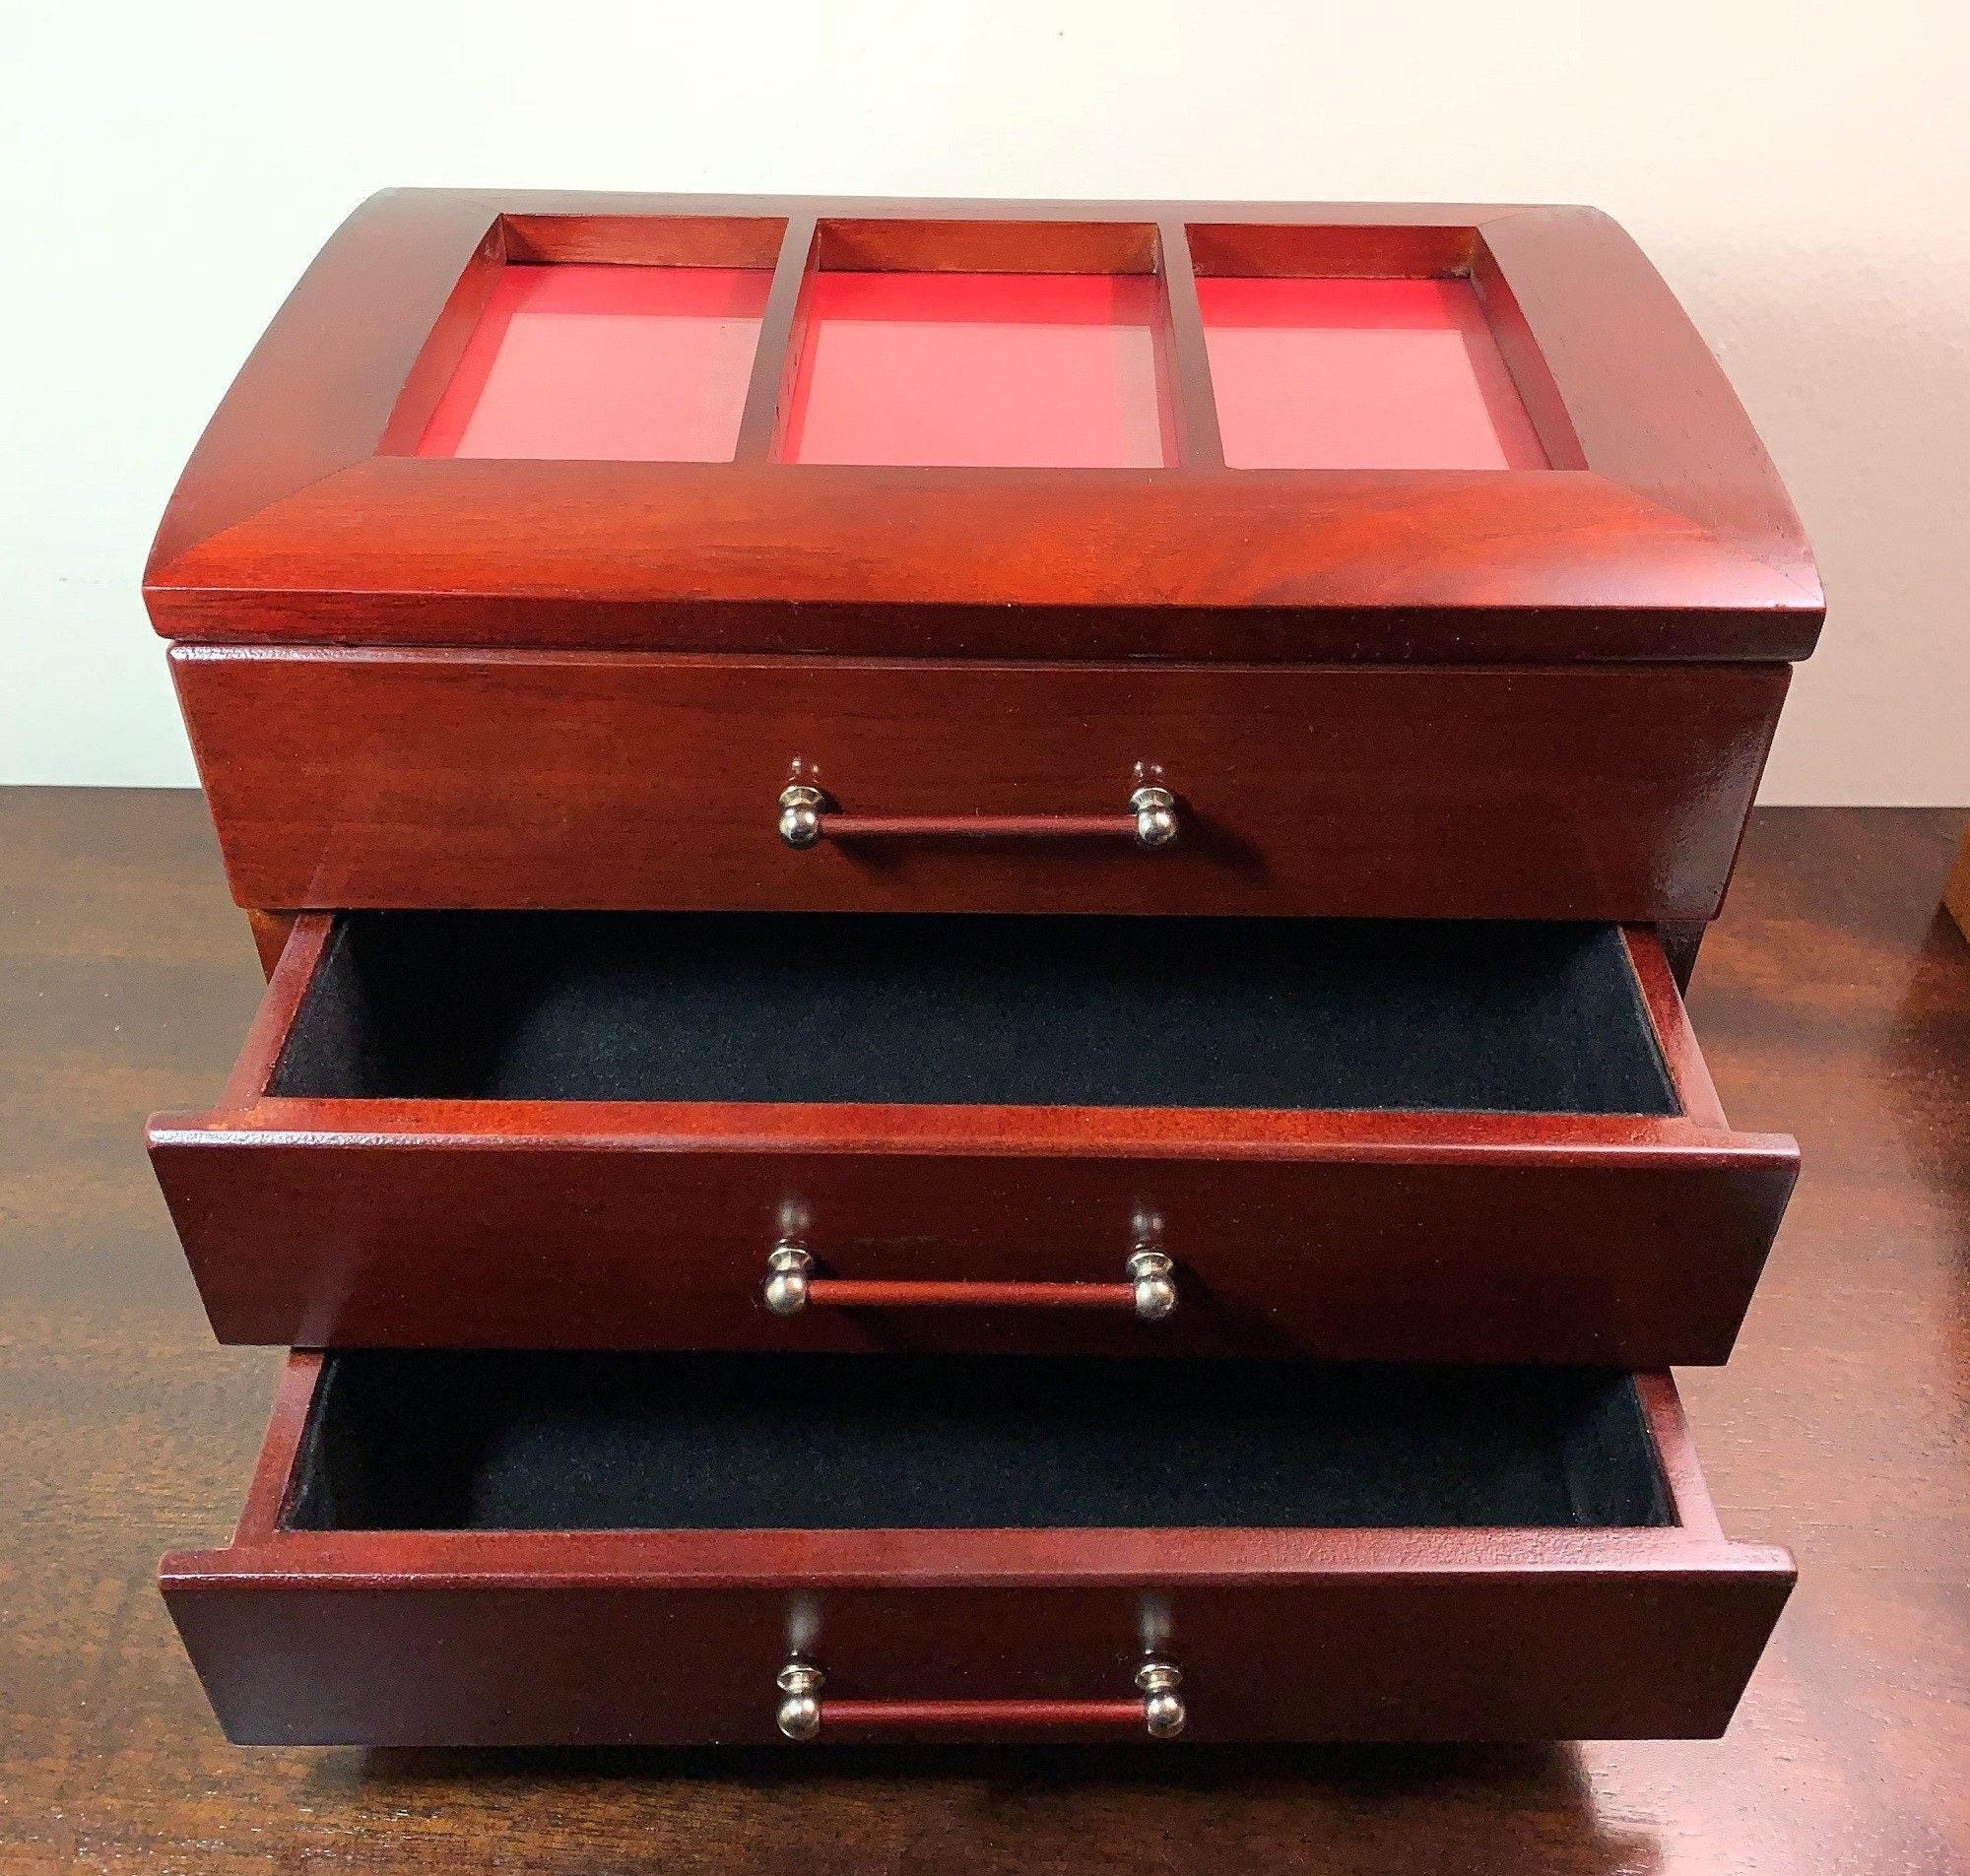 Vintage Solid Wood Jewelry Box - Storage, Glass Window Lid ...